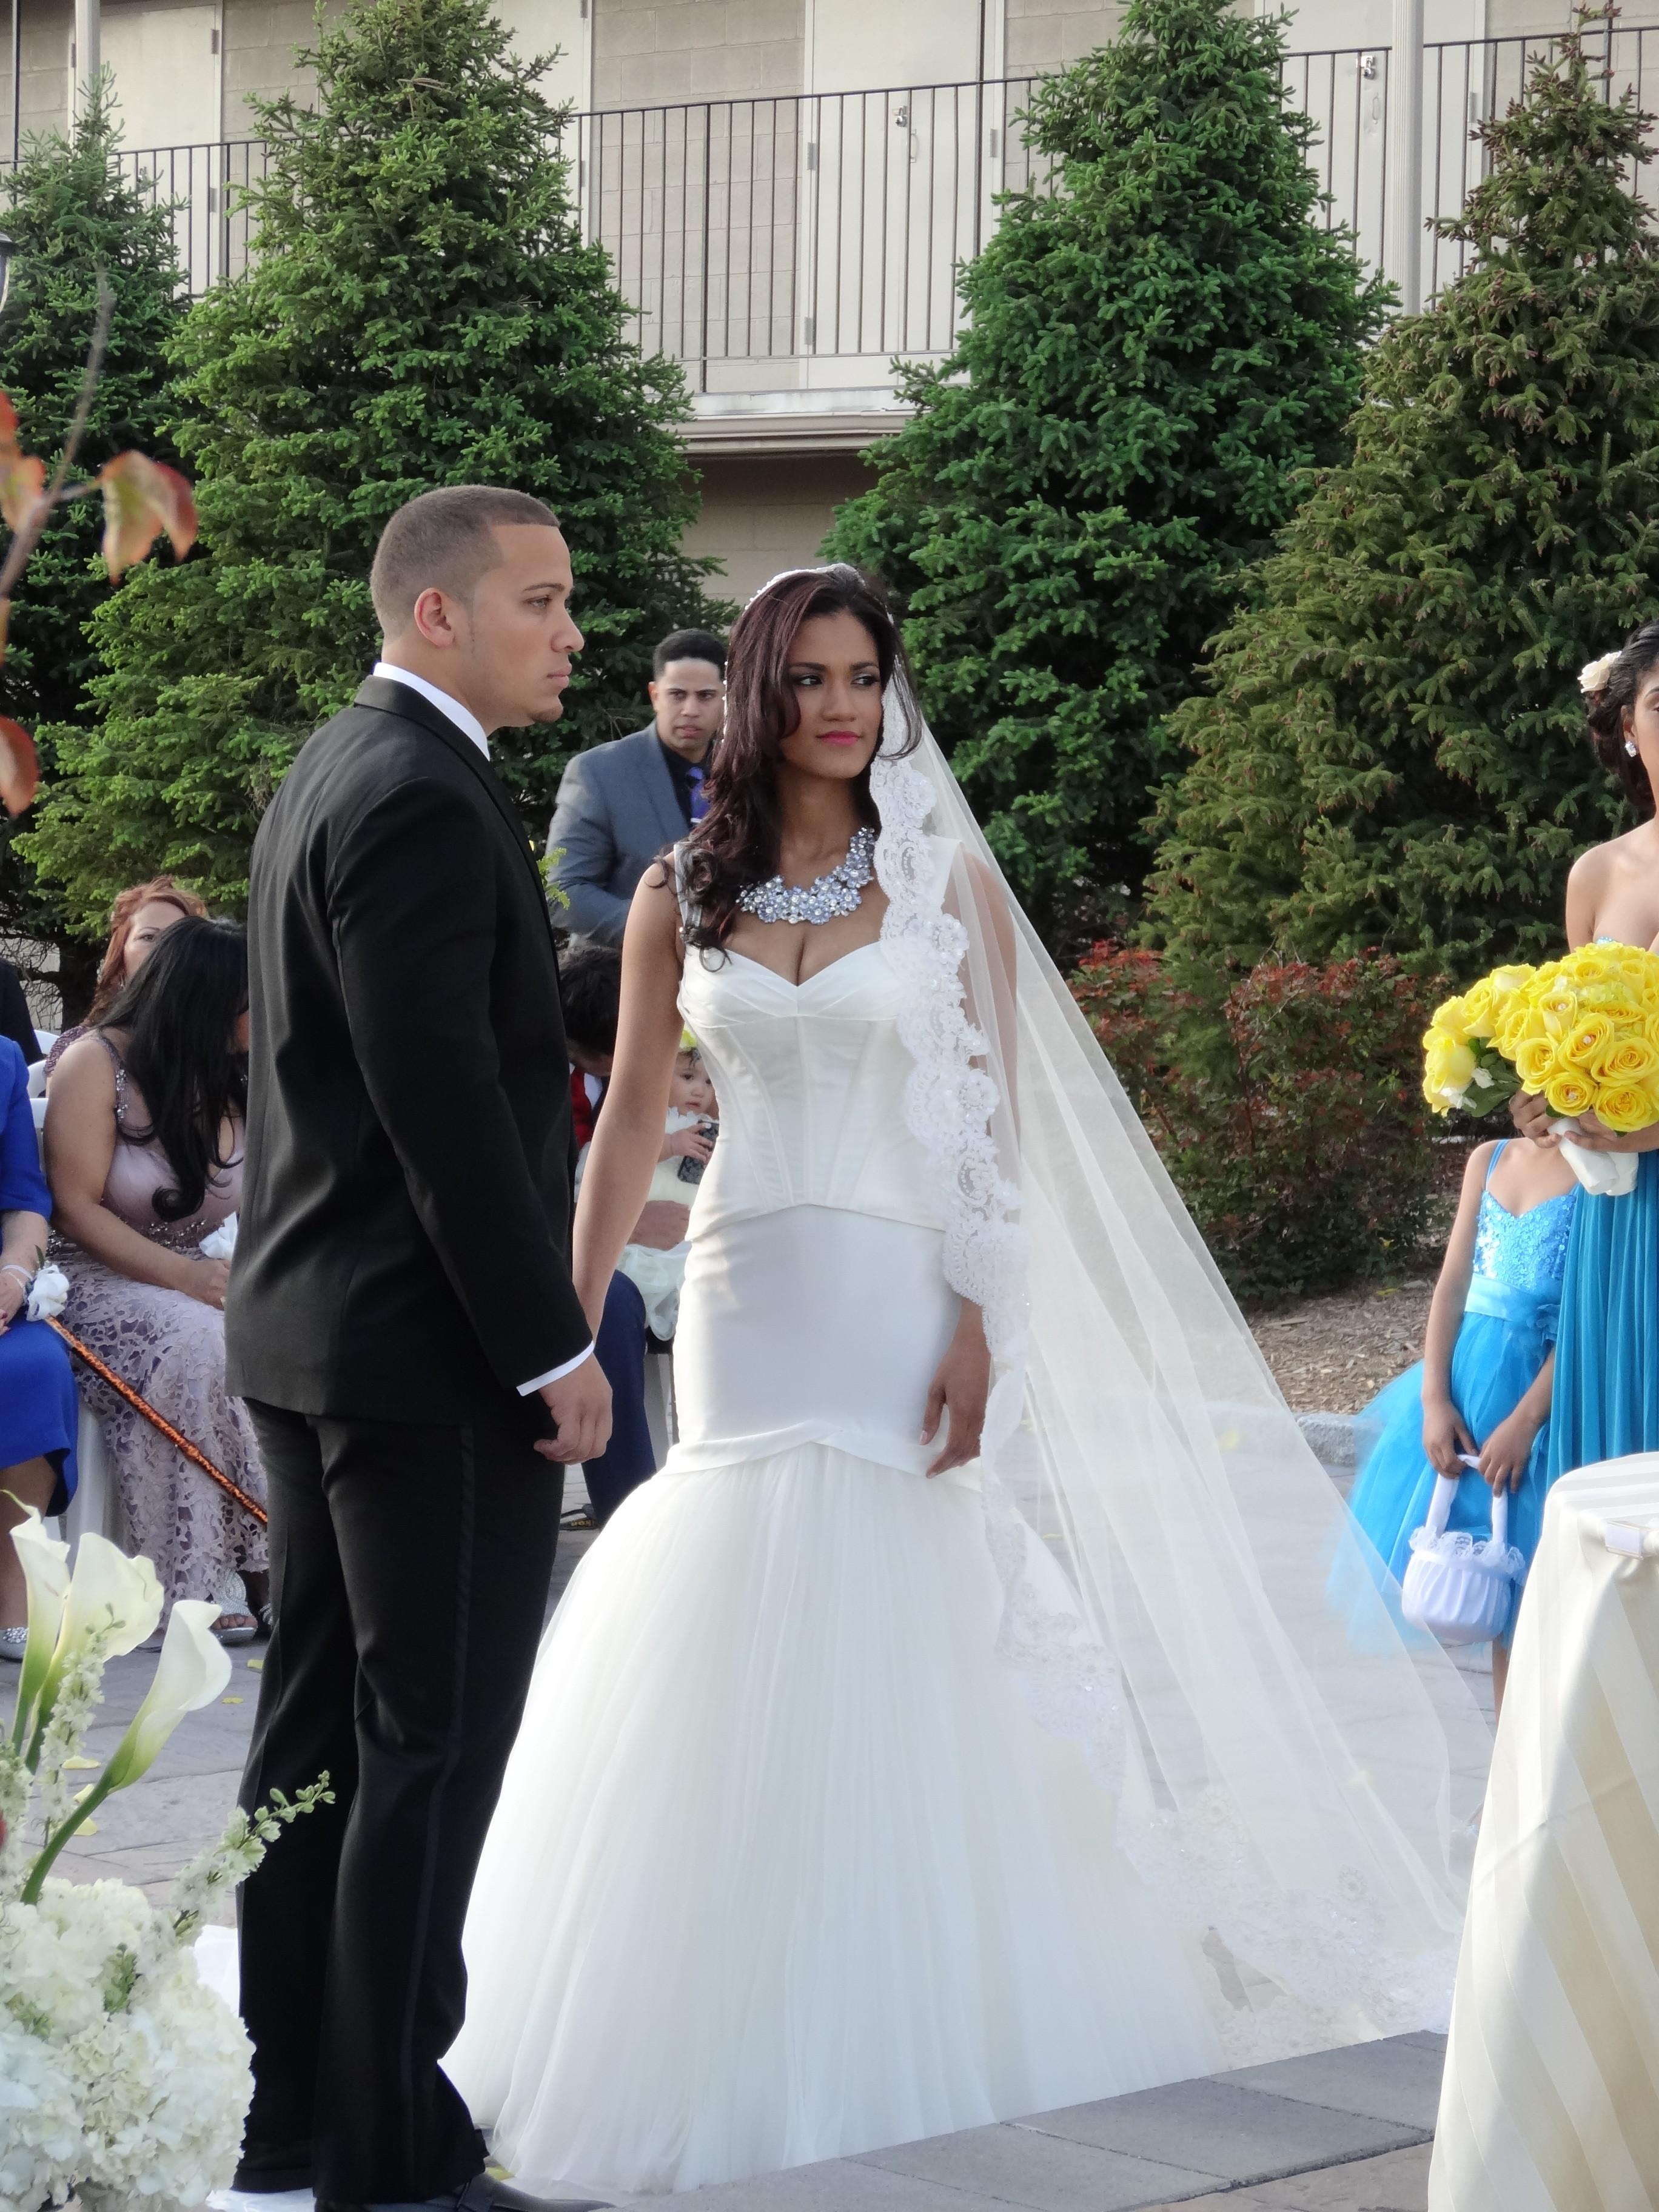 Greentree Country Club Wedding Reception - Ceremony